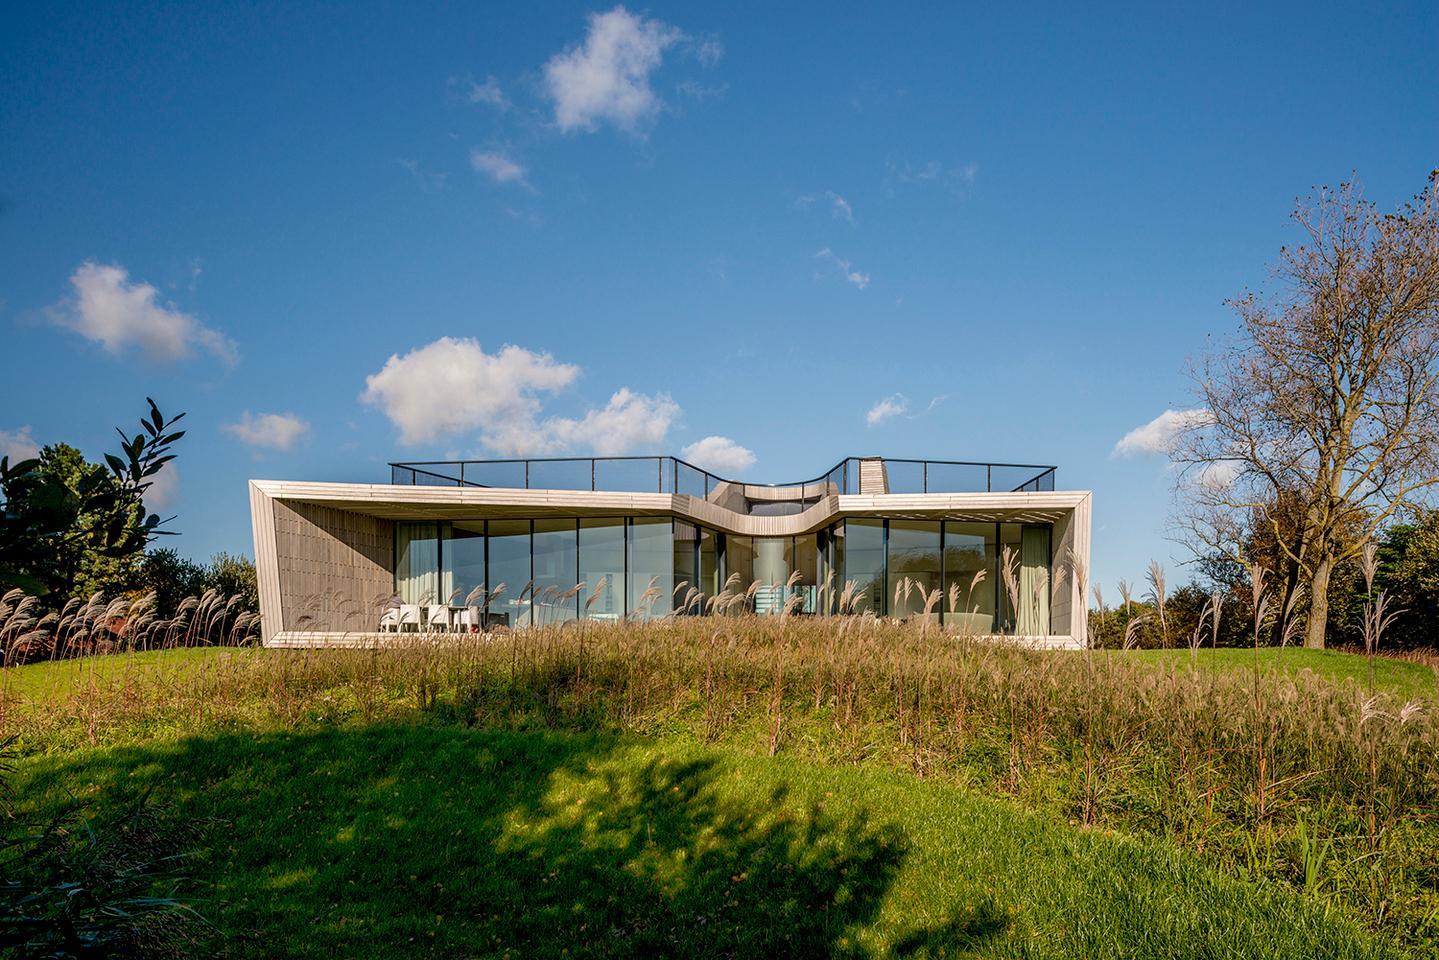 W.I.N.D. House, by Dutch firm UNStudio (Photo: Fedde de Weert)